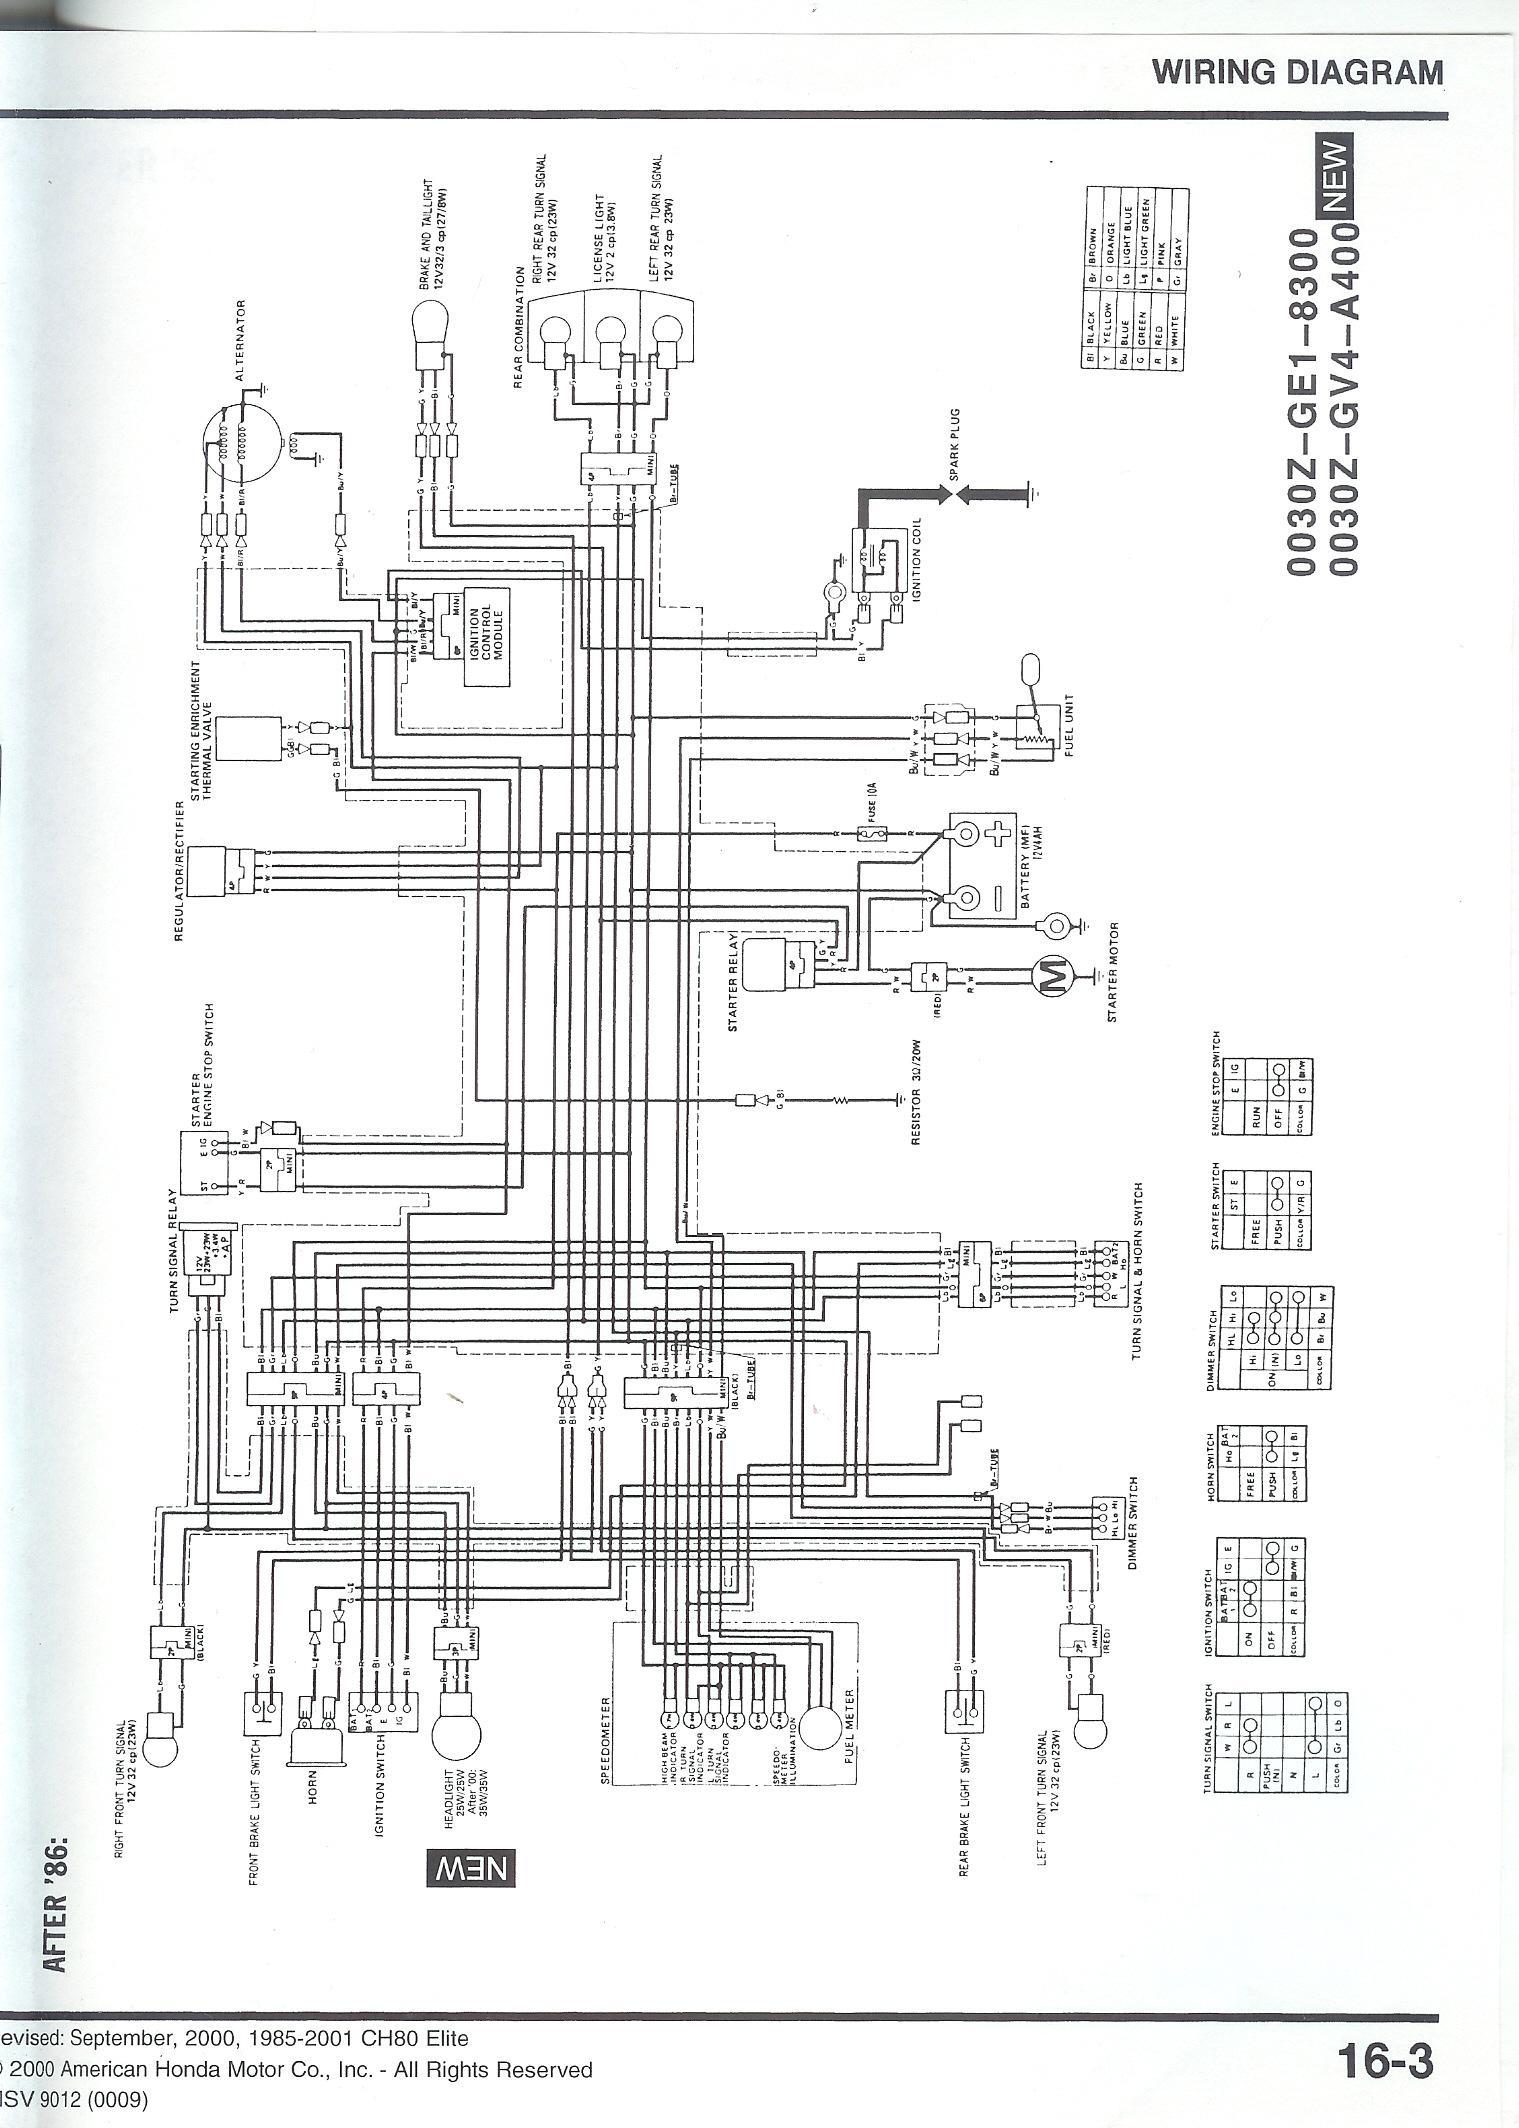 honda elite 250 diagram wiring - logic block diagram -  loader.bmw-in-e46.jeanjaures37.fr  wiring diagram resource